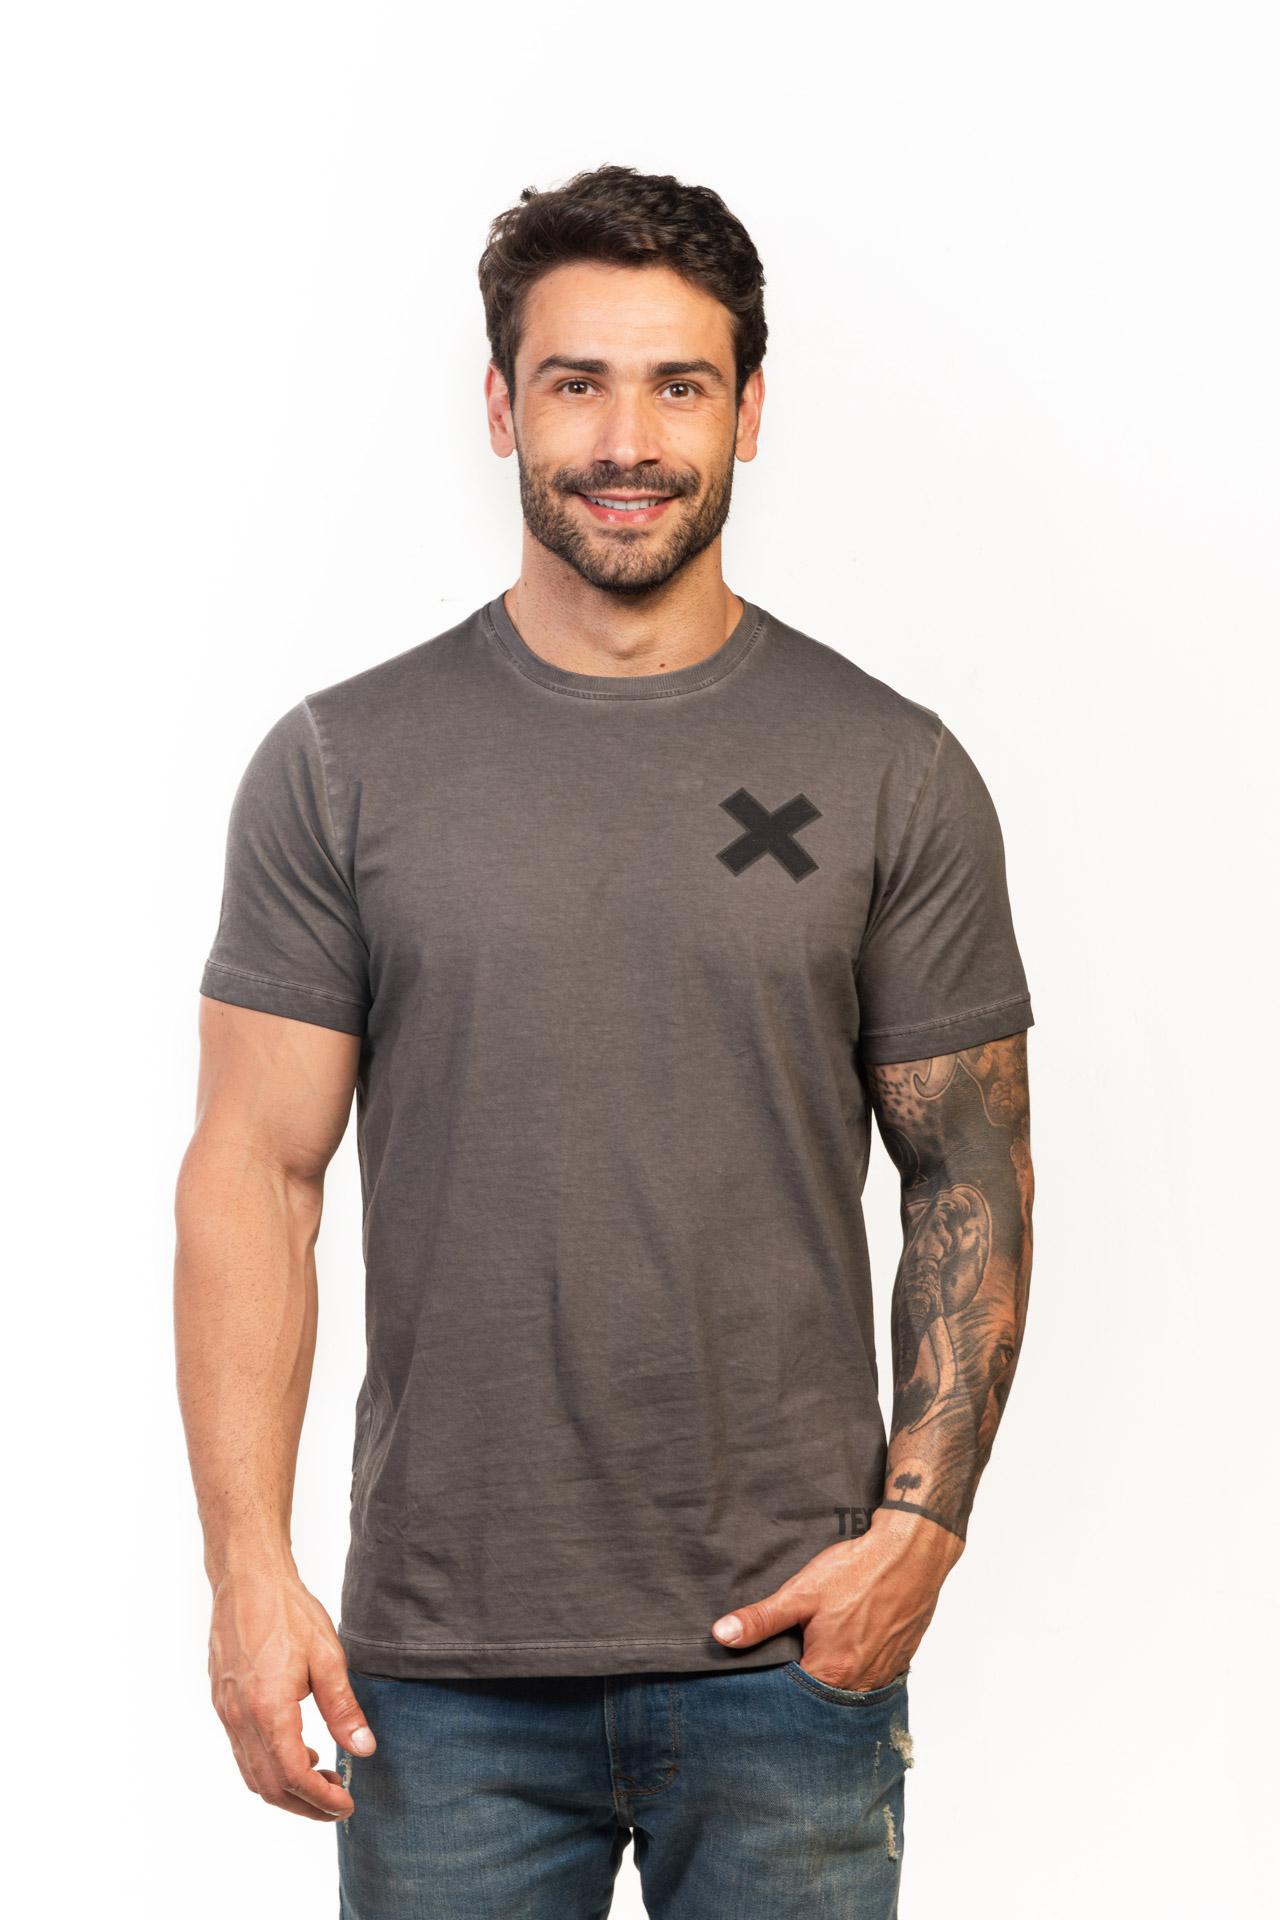 Camiseta Masculina TXC 1834